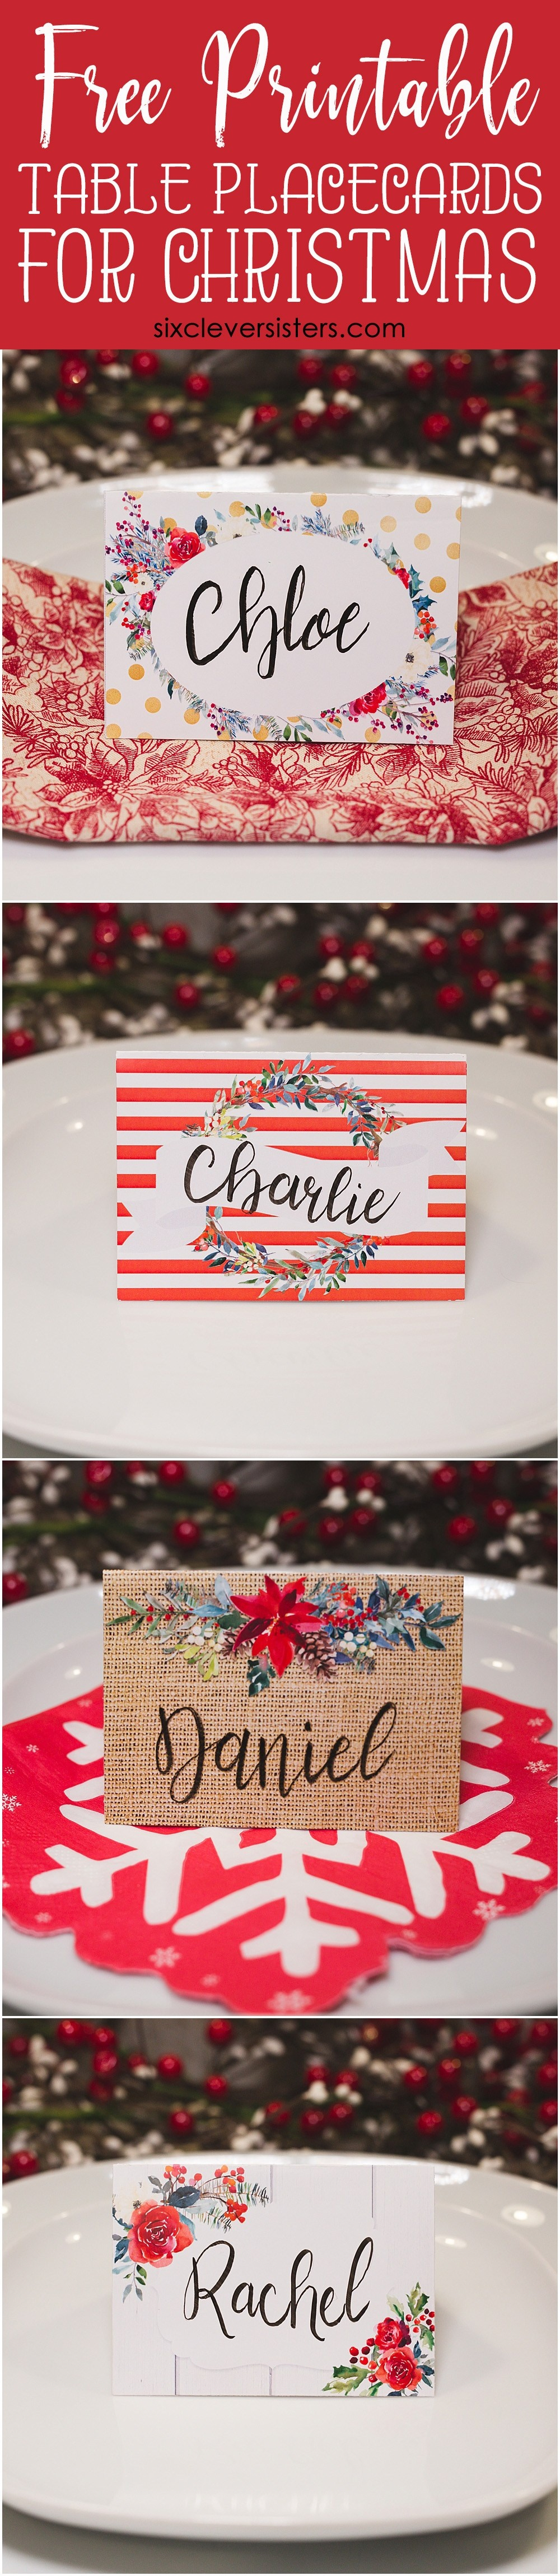 Christmas Table Place Cards { Free Printable} - Six Clever Sisters - Free Printable Christmas Tent Cards